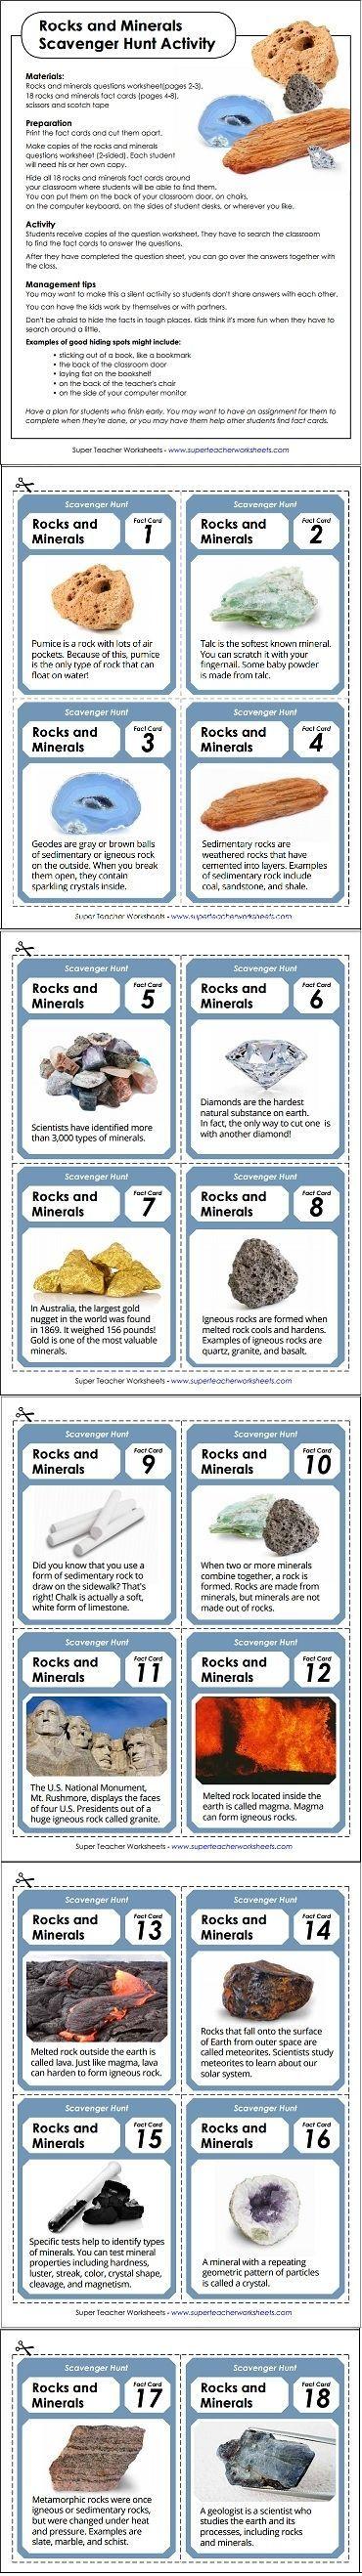 FREE Printable Rocks and Minerals Scavenger Hunt   Rocks and minerals [ 2636 x 370 Pixel ]